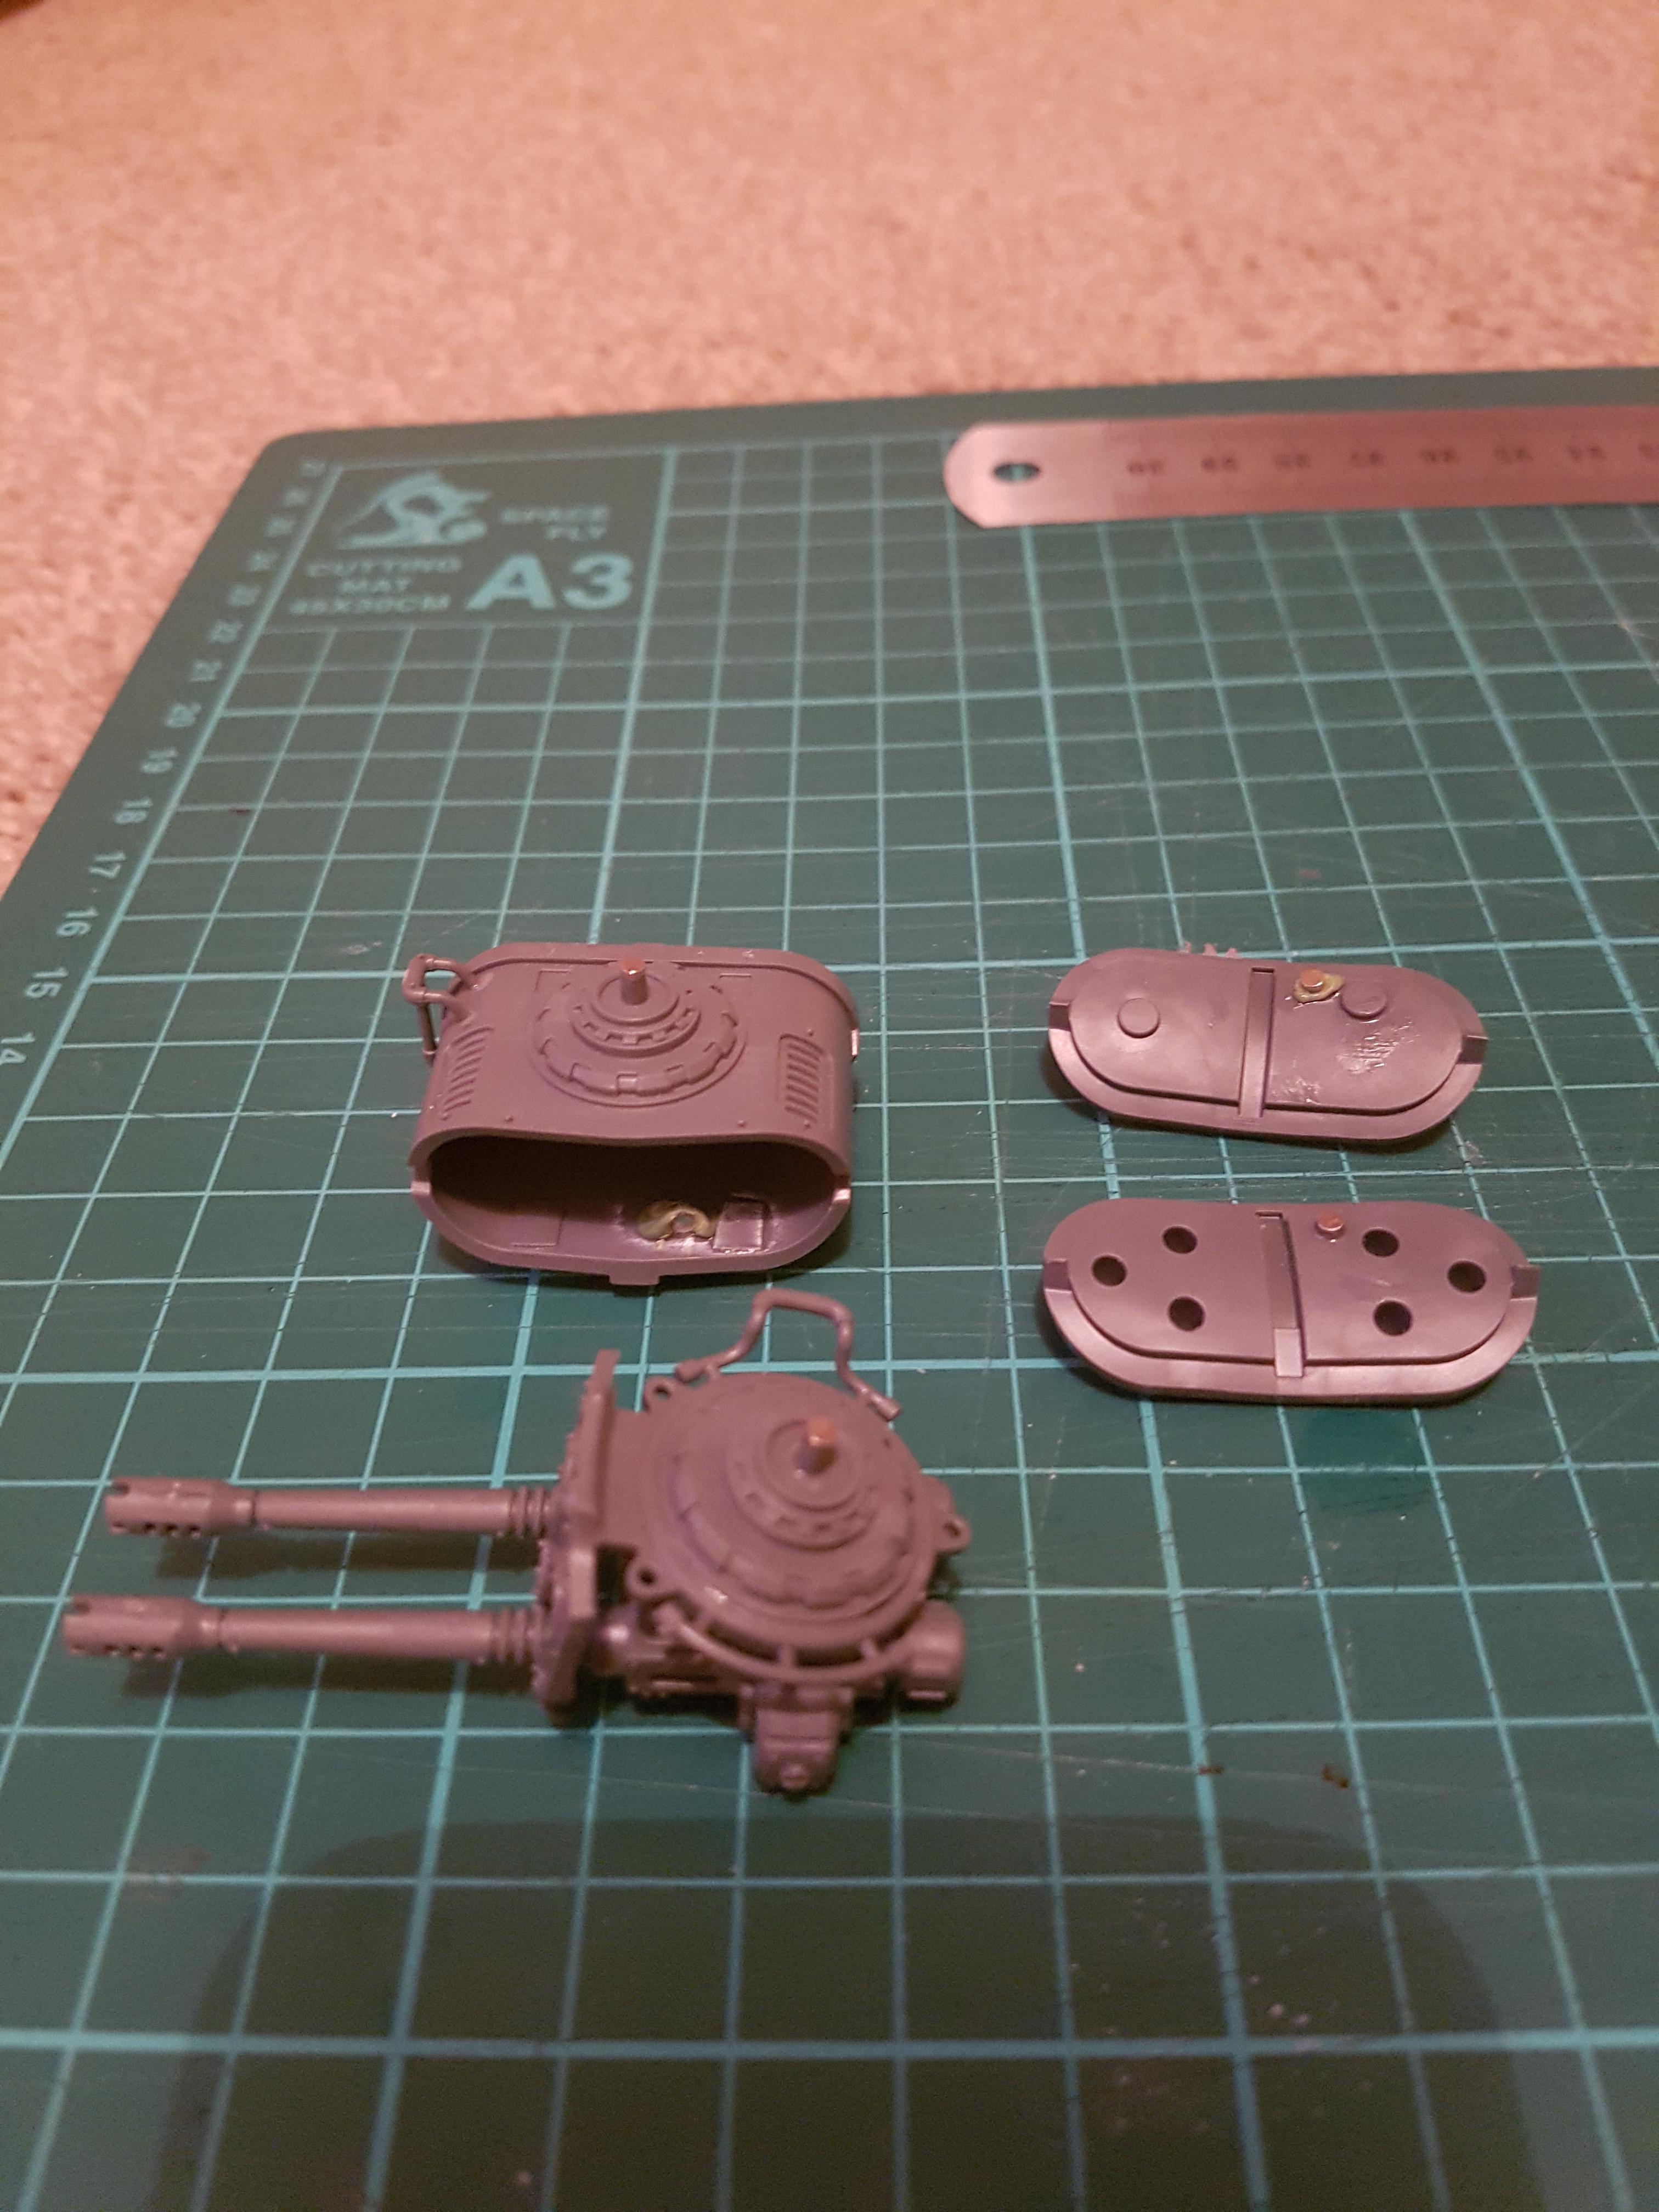 Fibre Optics, Imperial Knight, Magnet, Magnetising